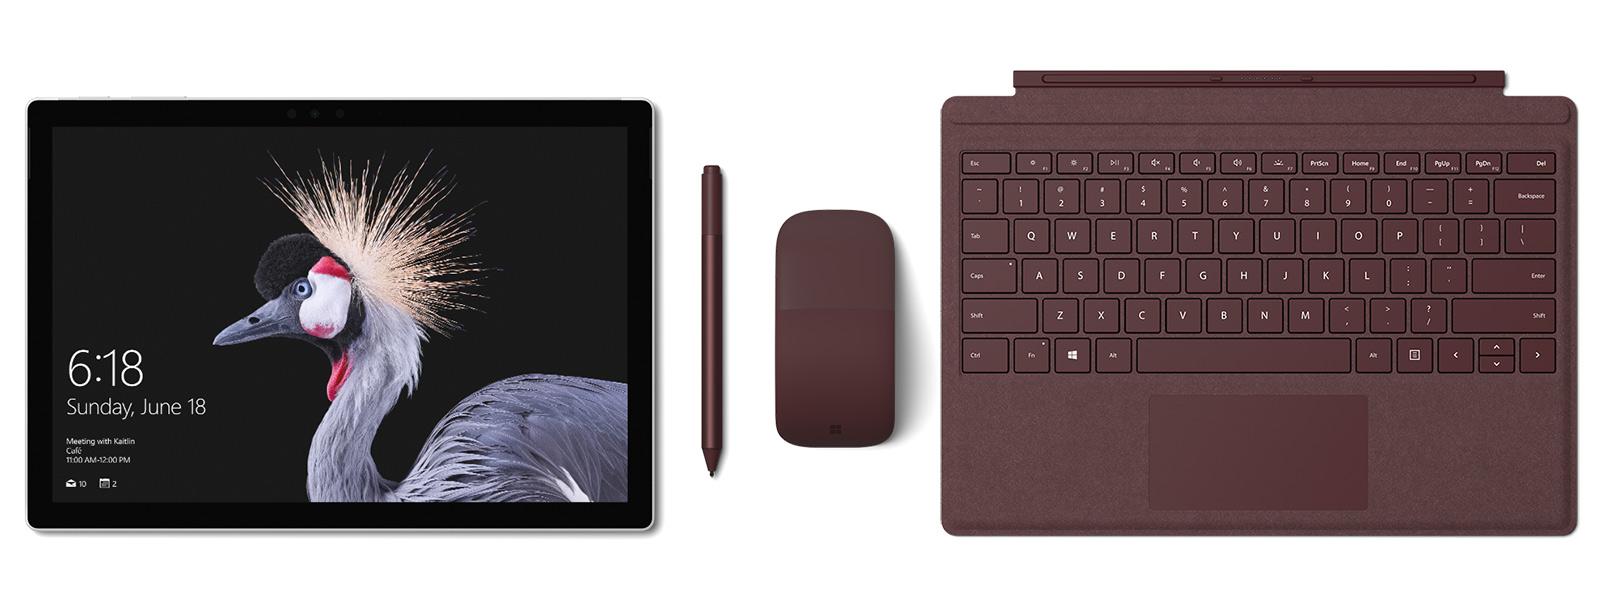 Afbeelding van Surface Pro met Surface Pro Signature Type Cover, Surface-pen en Surface Arc Mouse in bordeauxrood. Geleverd met Surface-pen.